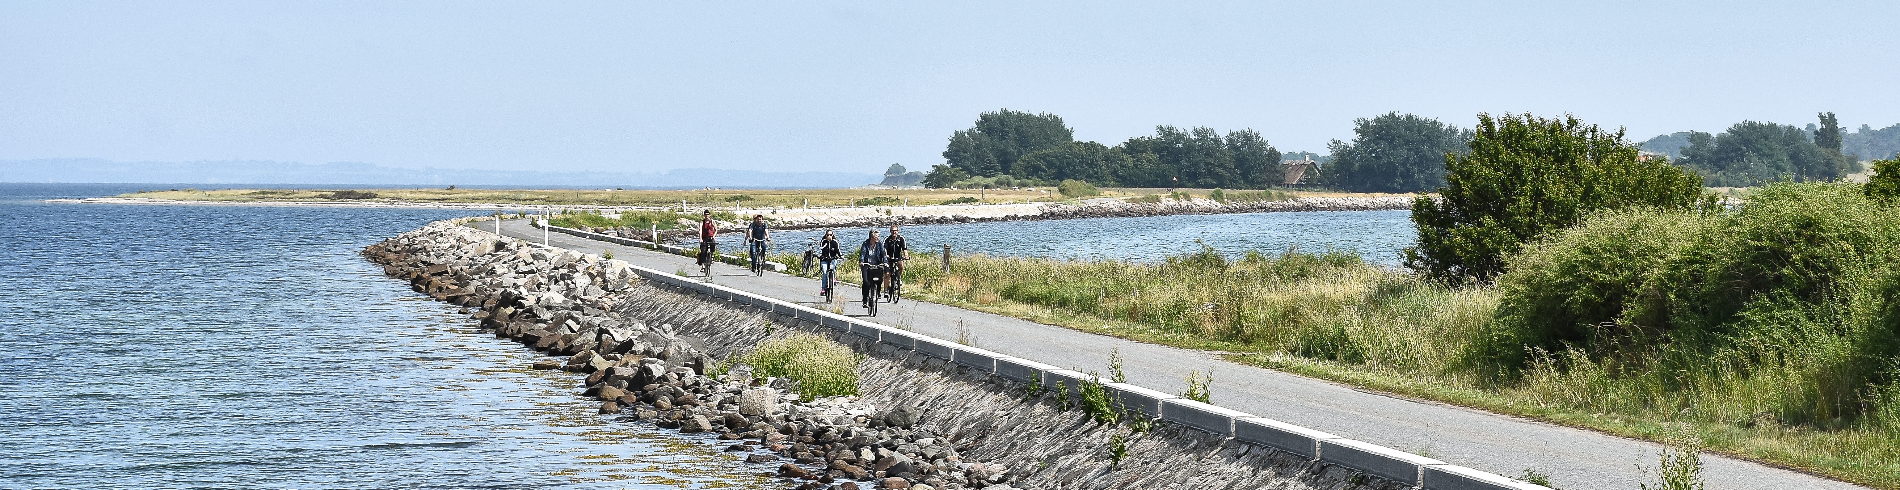 Discover The Danish Archipelago cover image